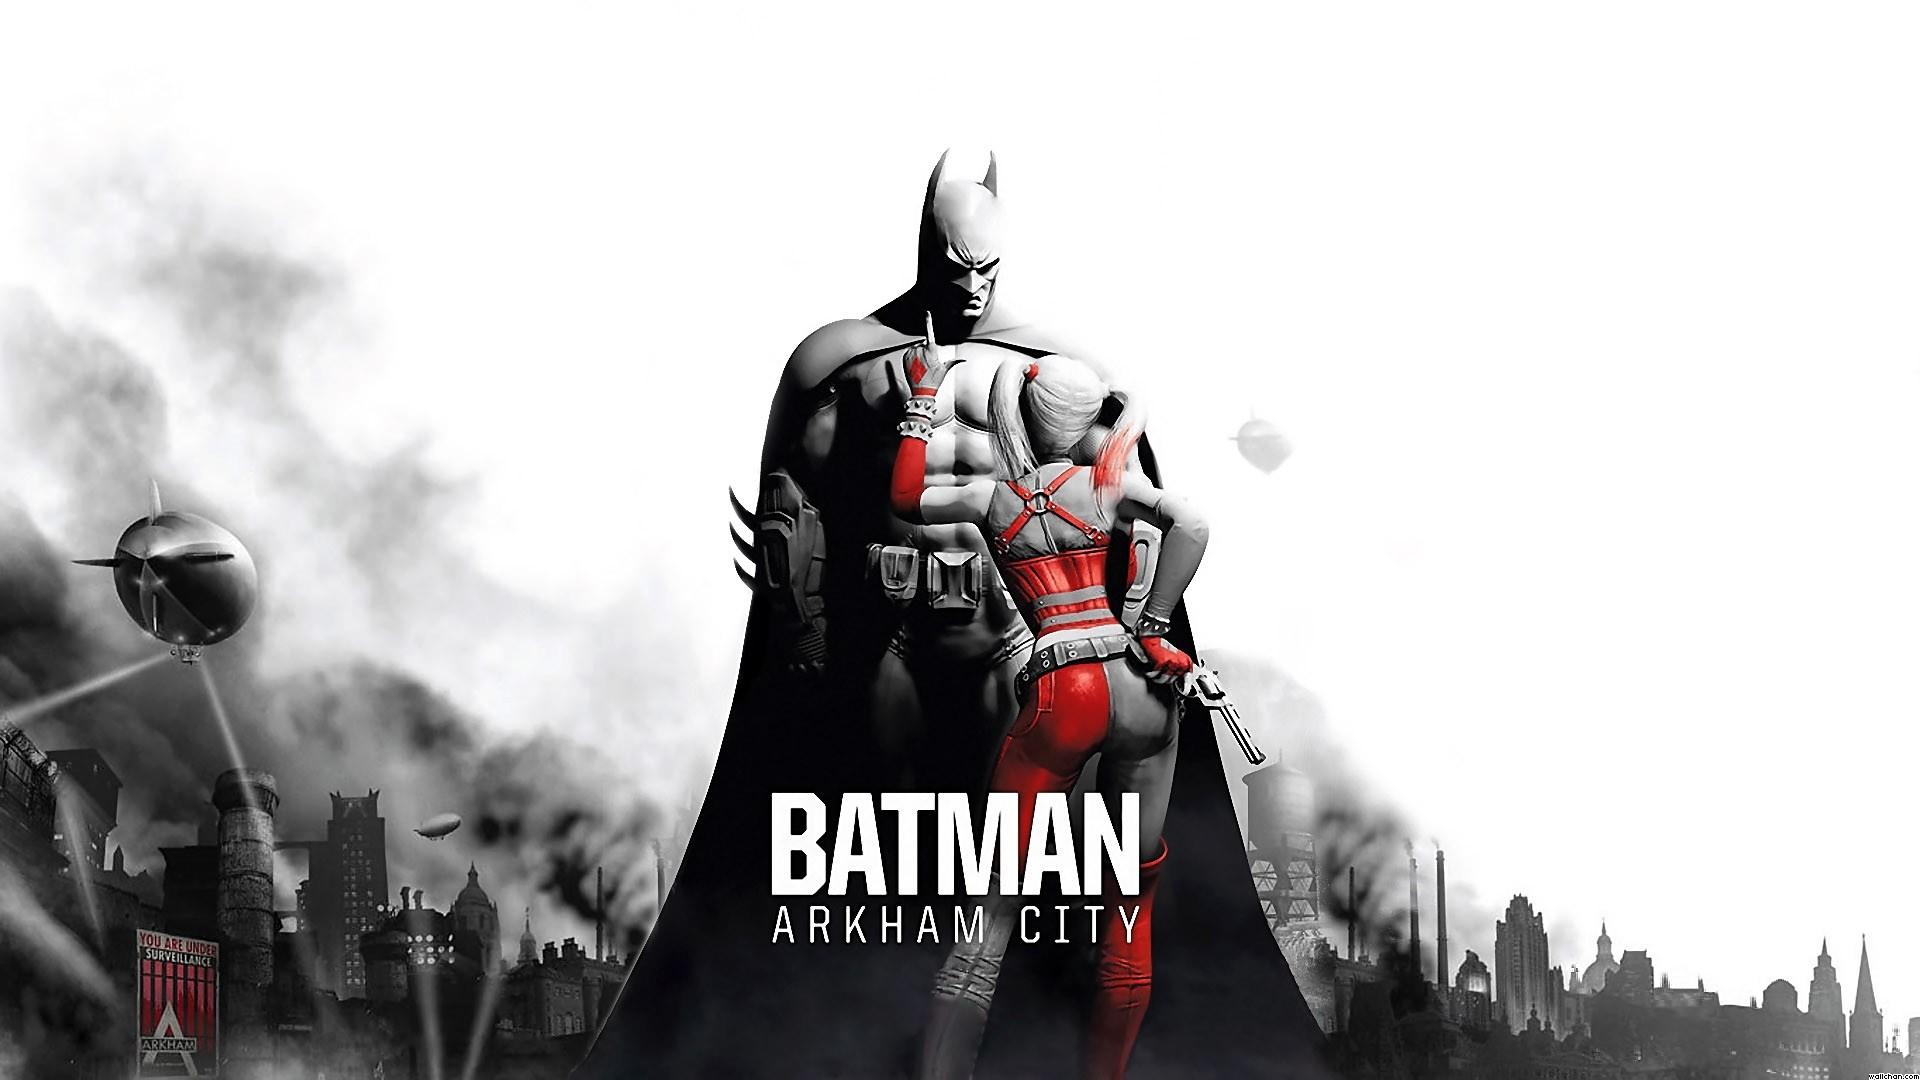 … 11070-batman-arkham-city-harley-quinn-wallpaper-1080p.